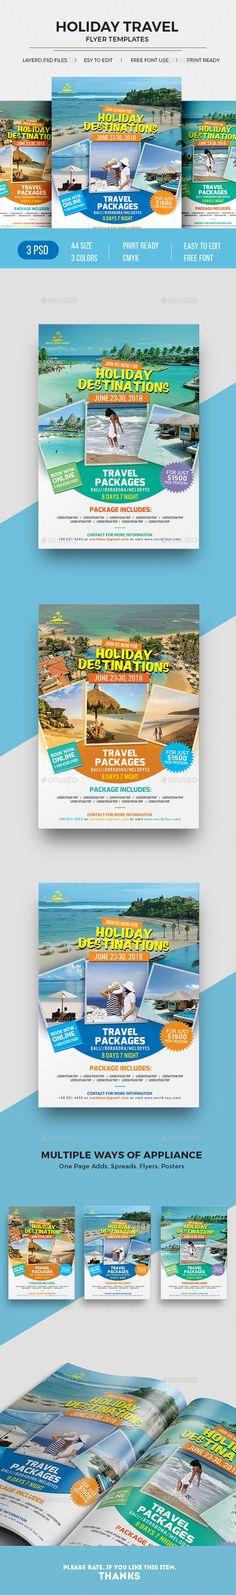 71 Best Travel Flyer Images On Pinterest Flyer Template Booklet